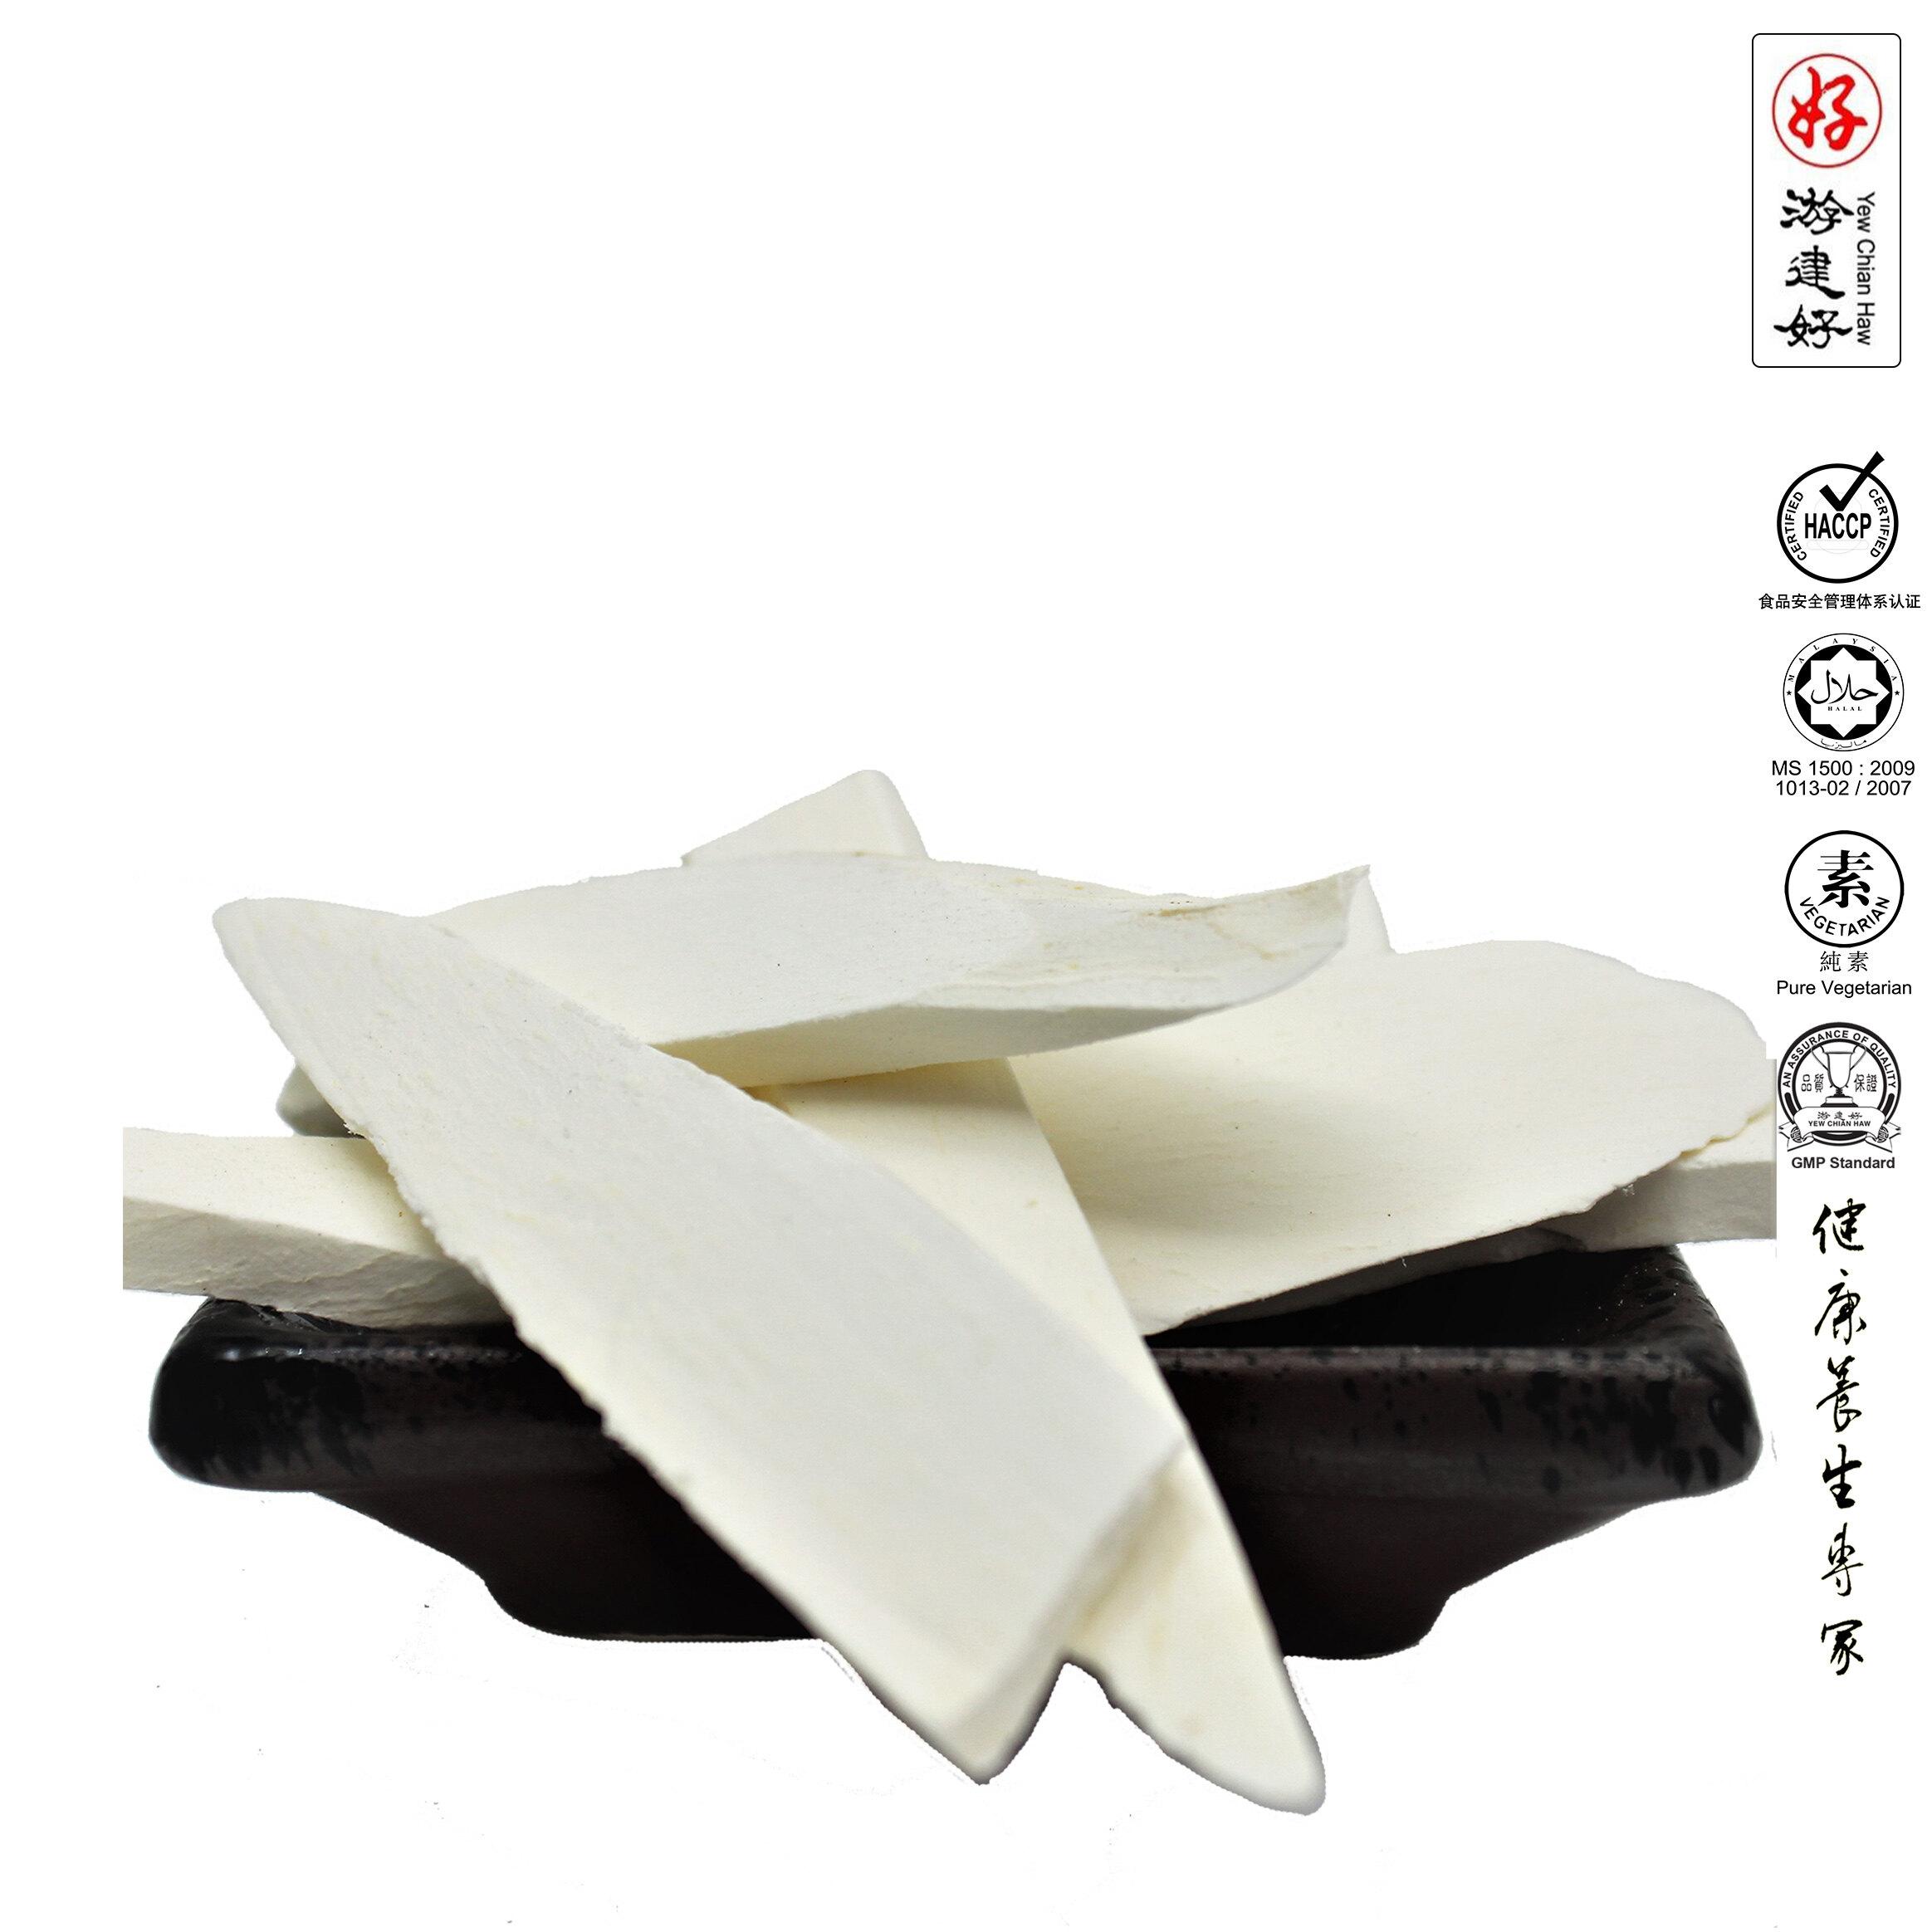 / (1) YCH Herbs Dried Wild Yam Slice / Dioscorea polystachya / Nagaimo (1KG Pack) HALAL